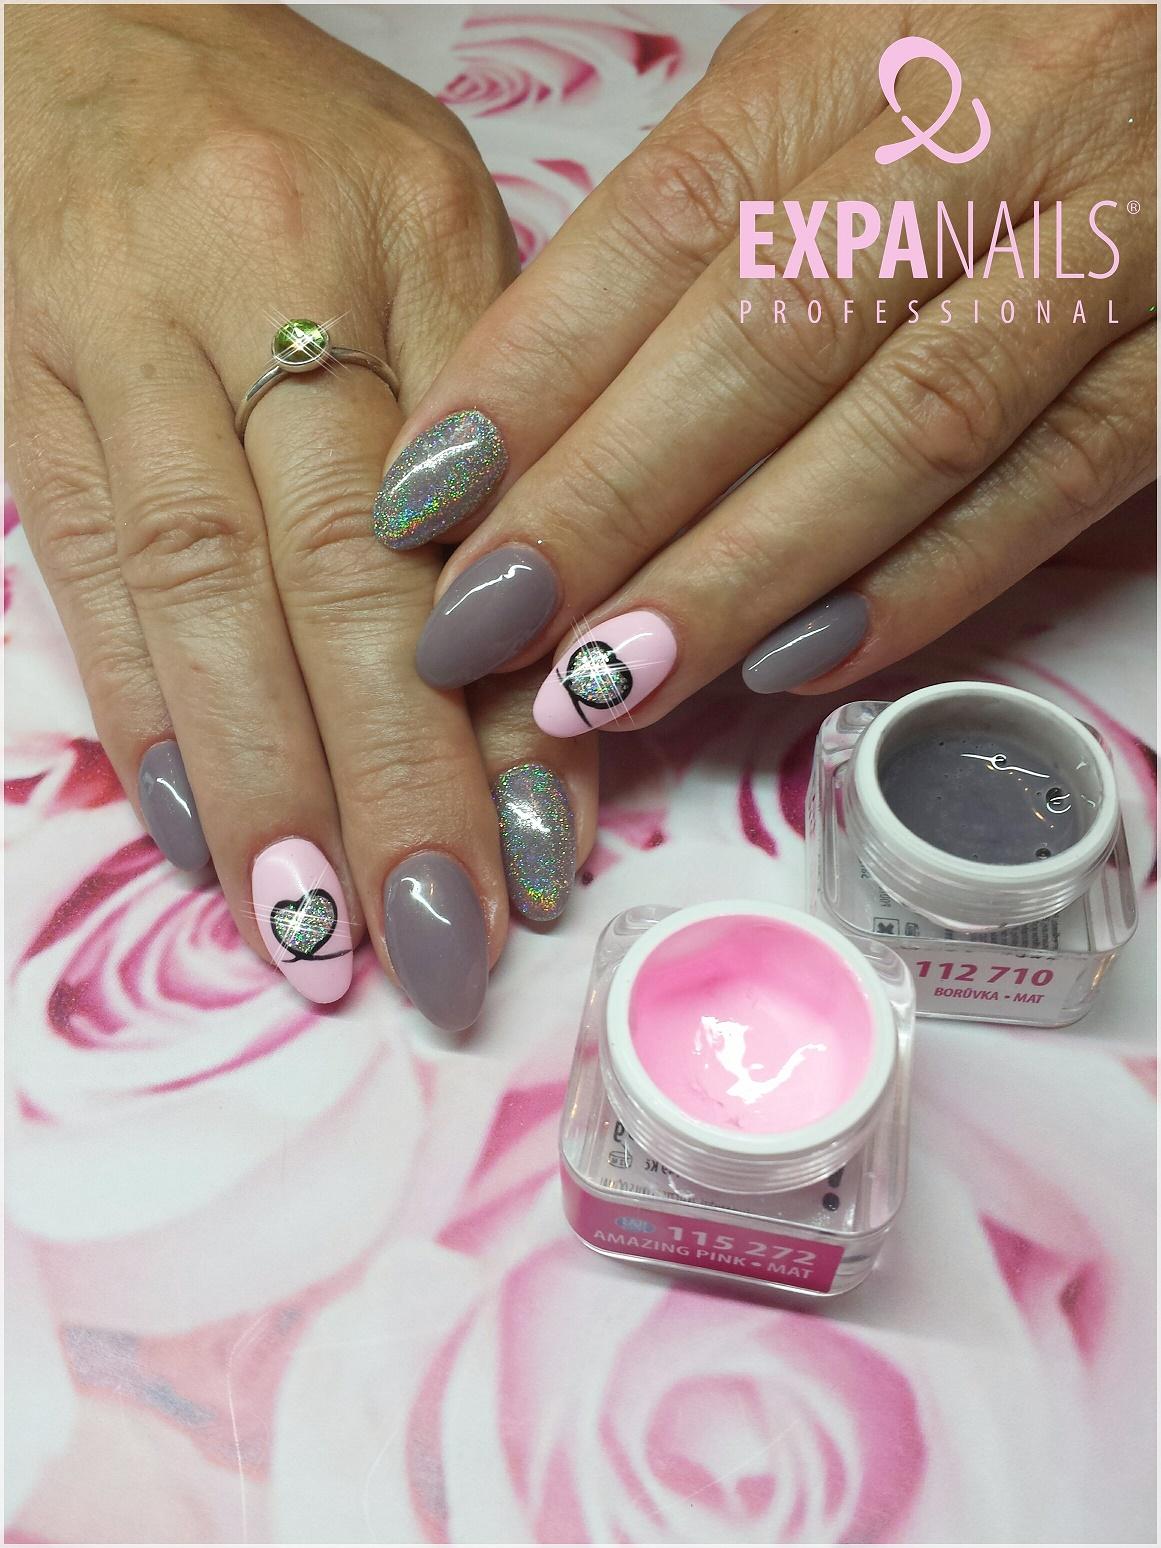 Inspirace Jaro Leto 2018 Fotogalerie Expa Nails